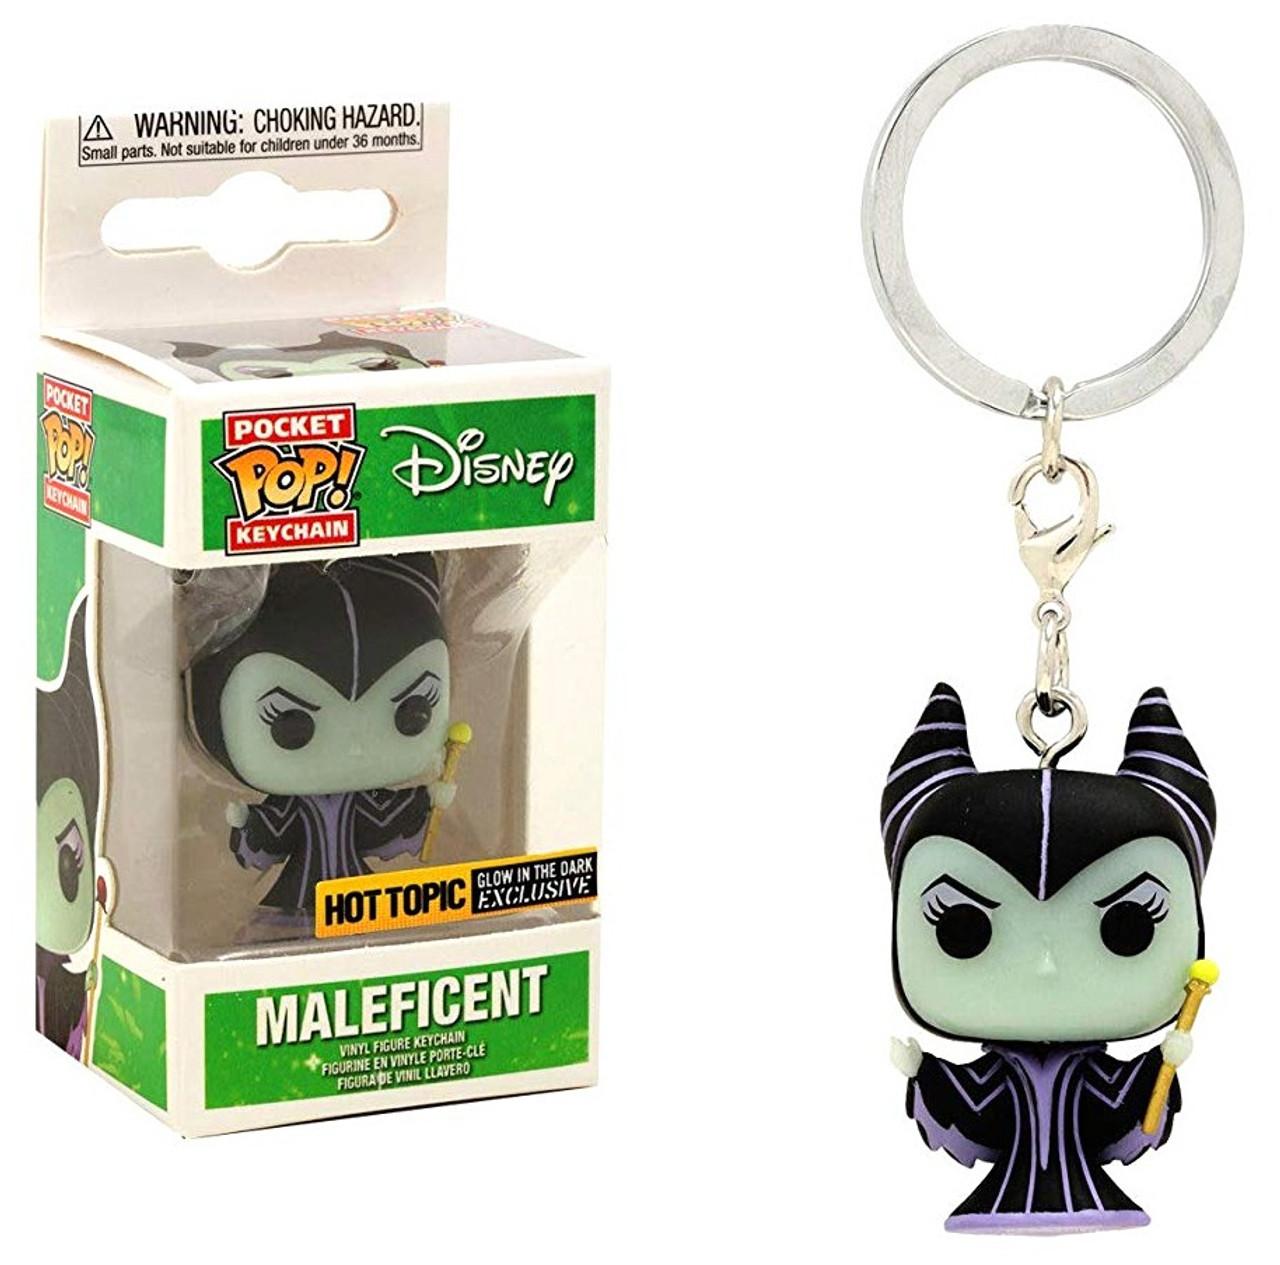 Maleficent Glow Pocket Pop Keychain FunKo Free Shipping! Sleeping Beauty